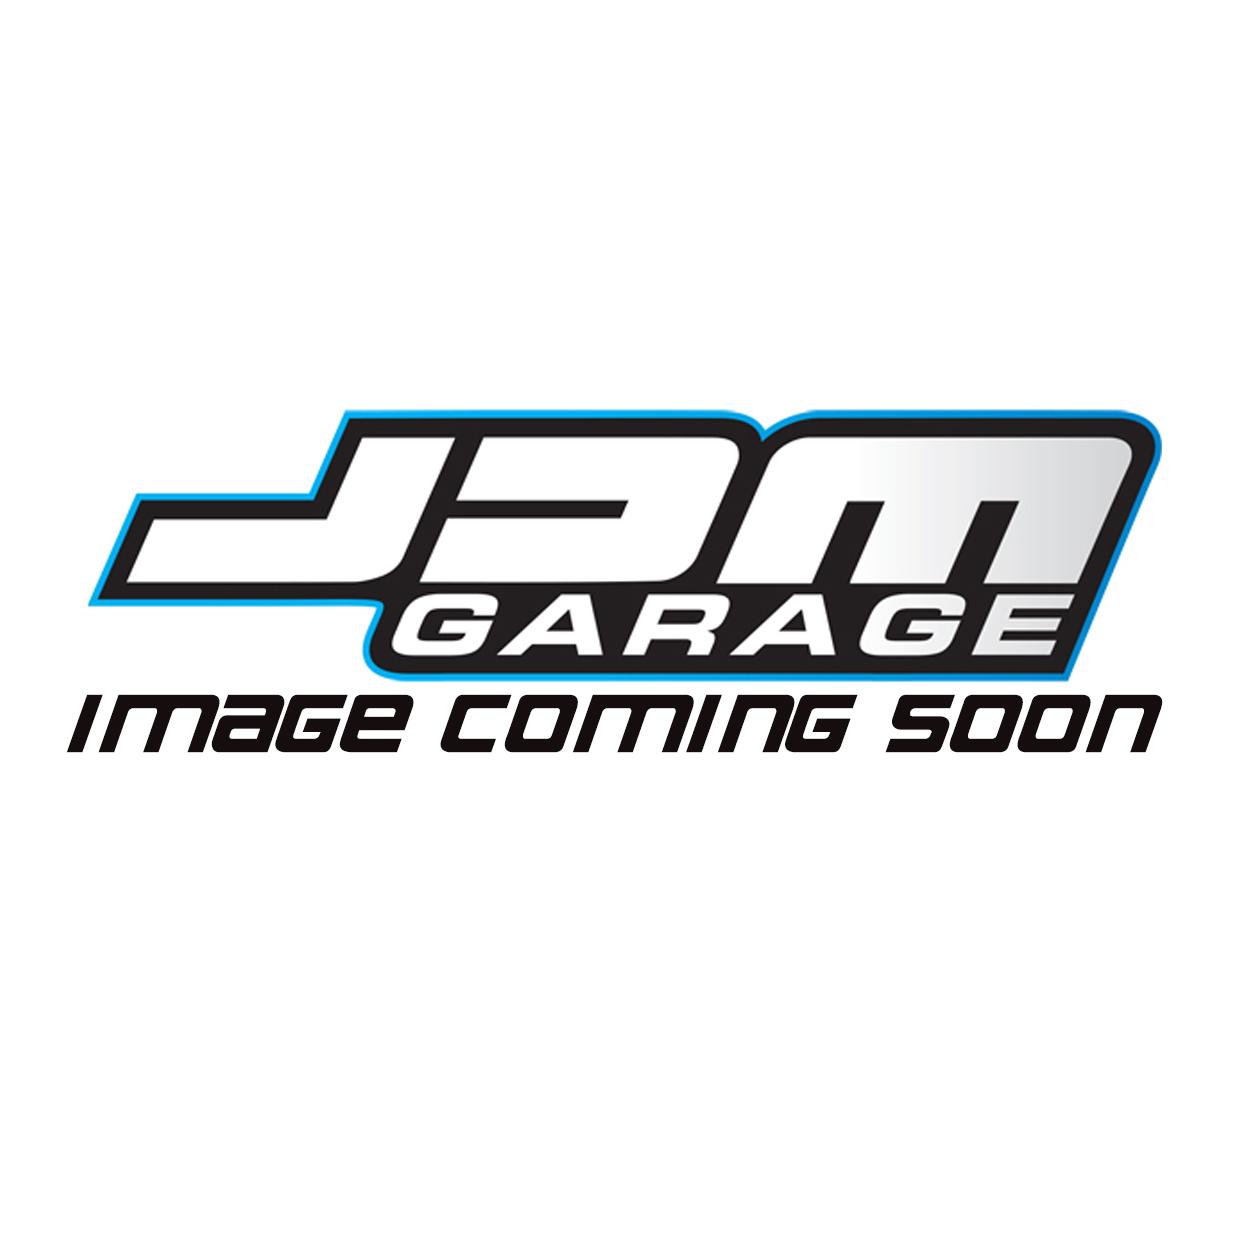 Genuine Nissan Timing Chain Tensioner Gasket fits Nissan Silvia S13 180SX S14 200SX S15 SR20DET 13079-2J200